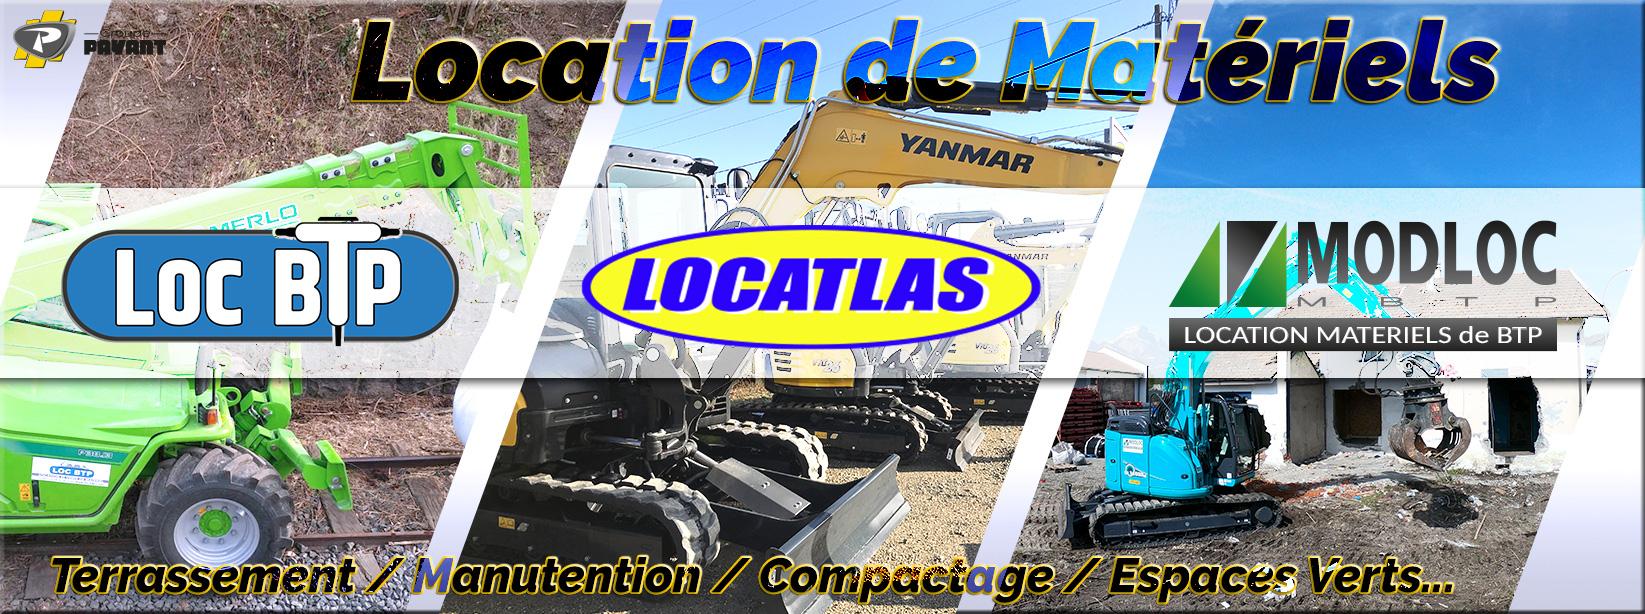 Service location : Loc BTP, Locatlas, Modloc - Groupe PAYANT